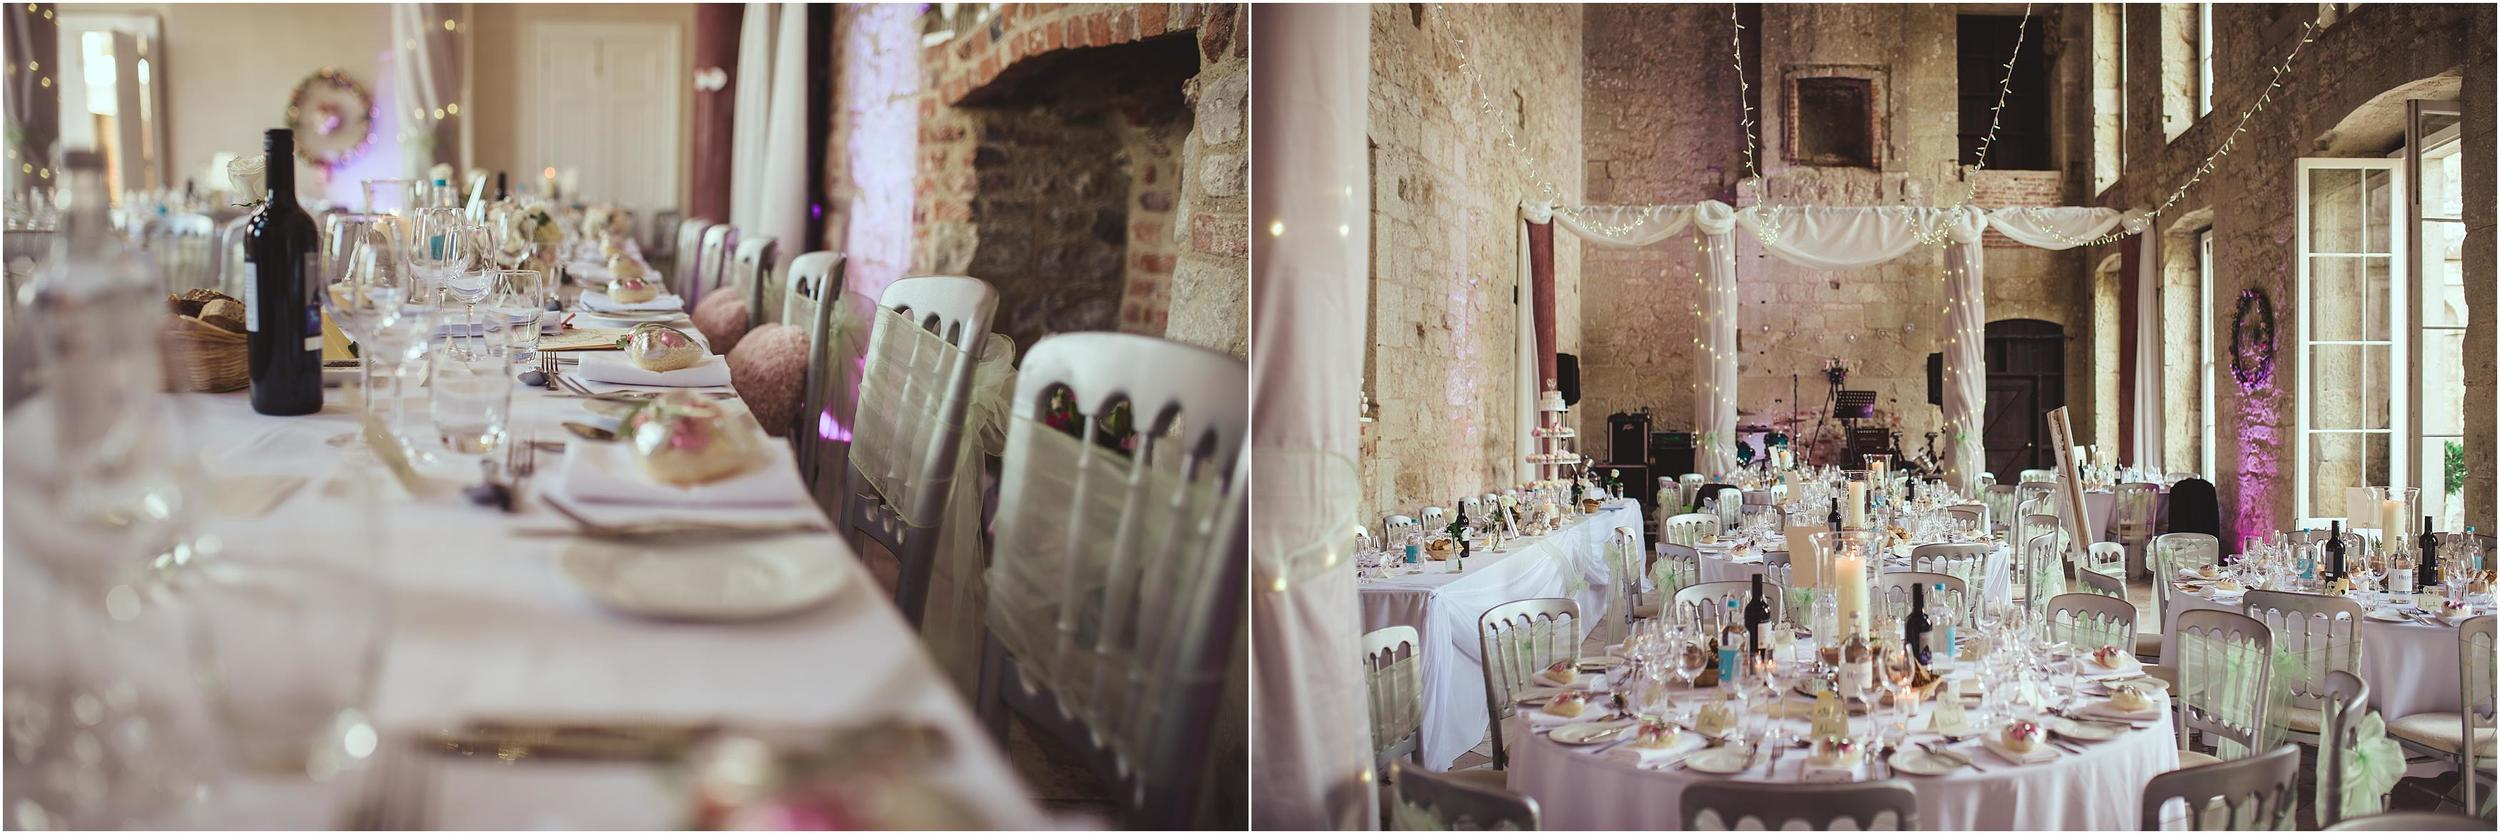 Appuldurcombe house wedding_0056.jpg